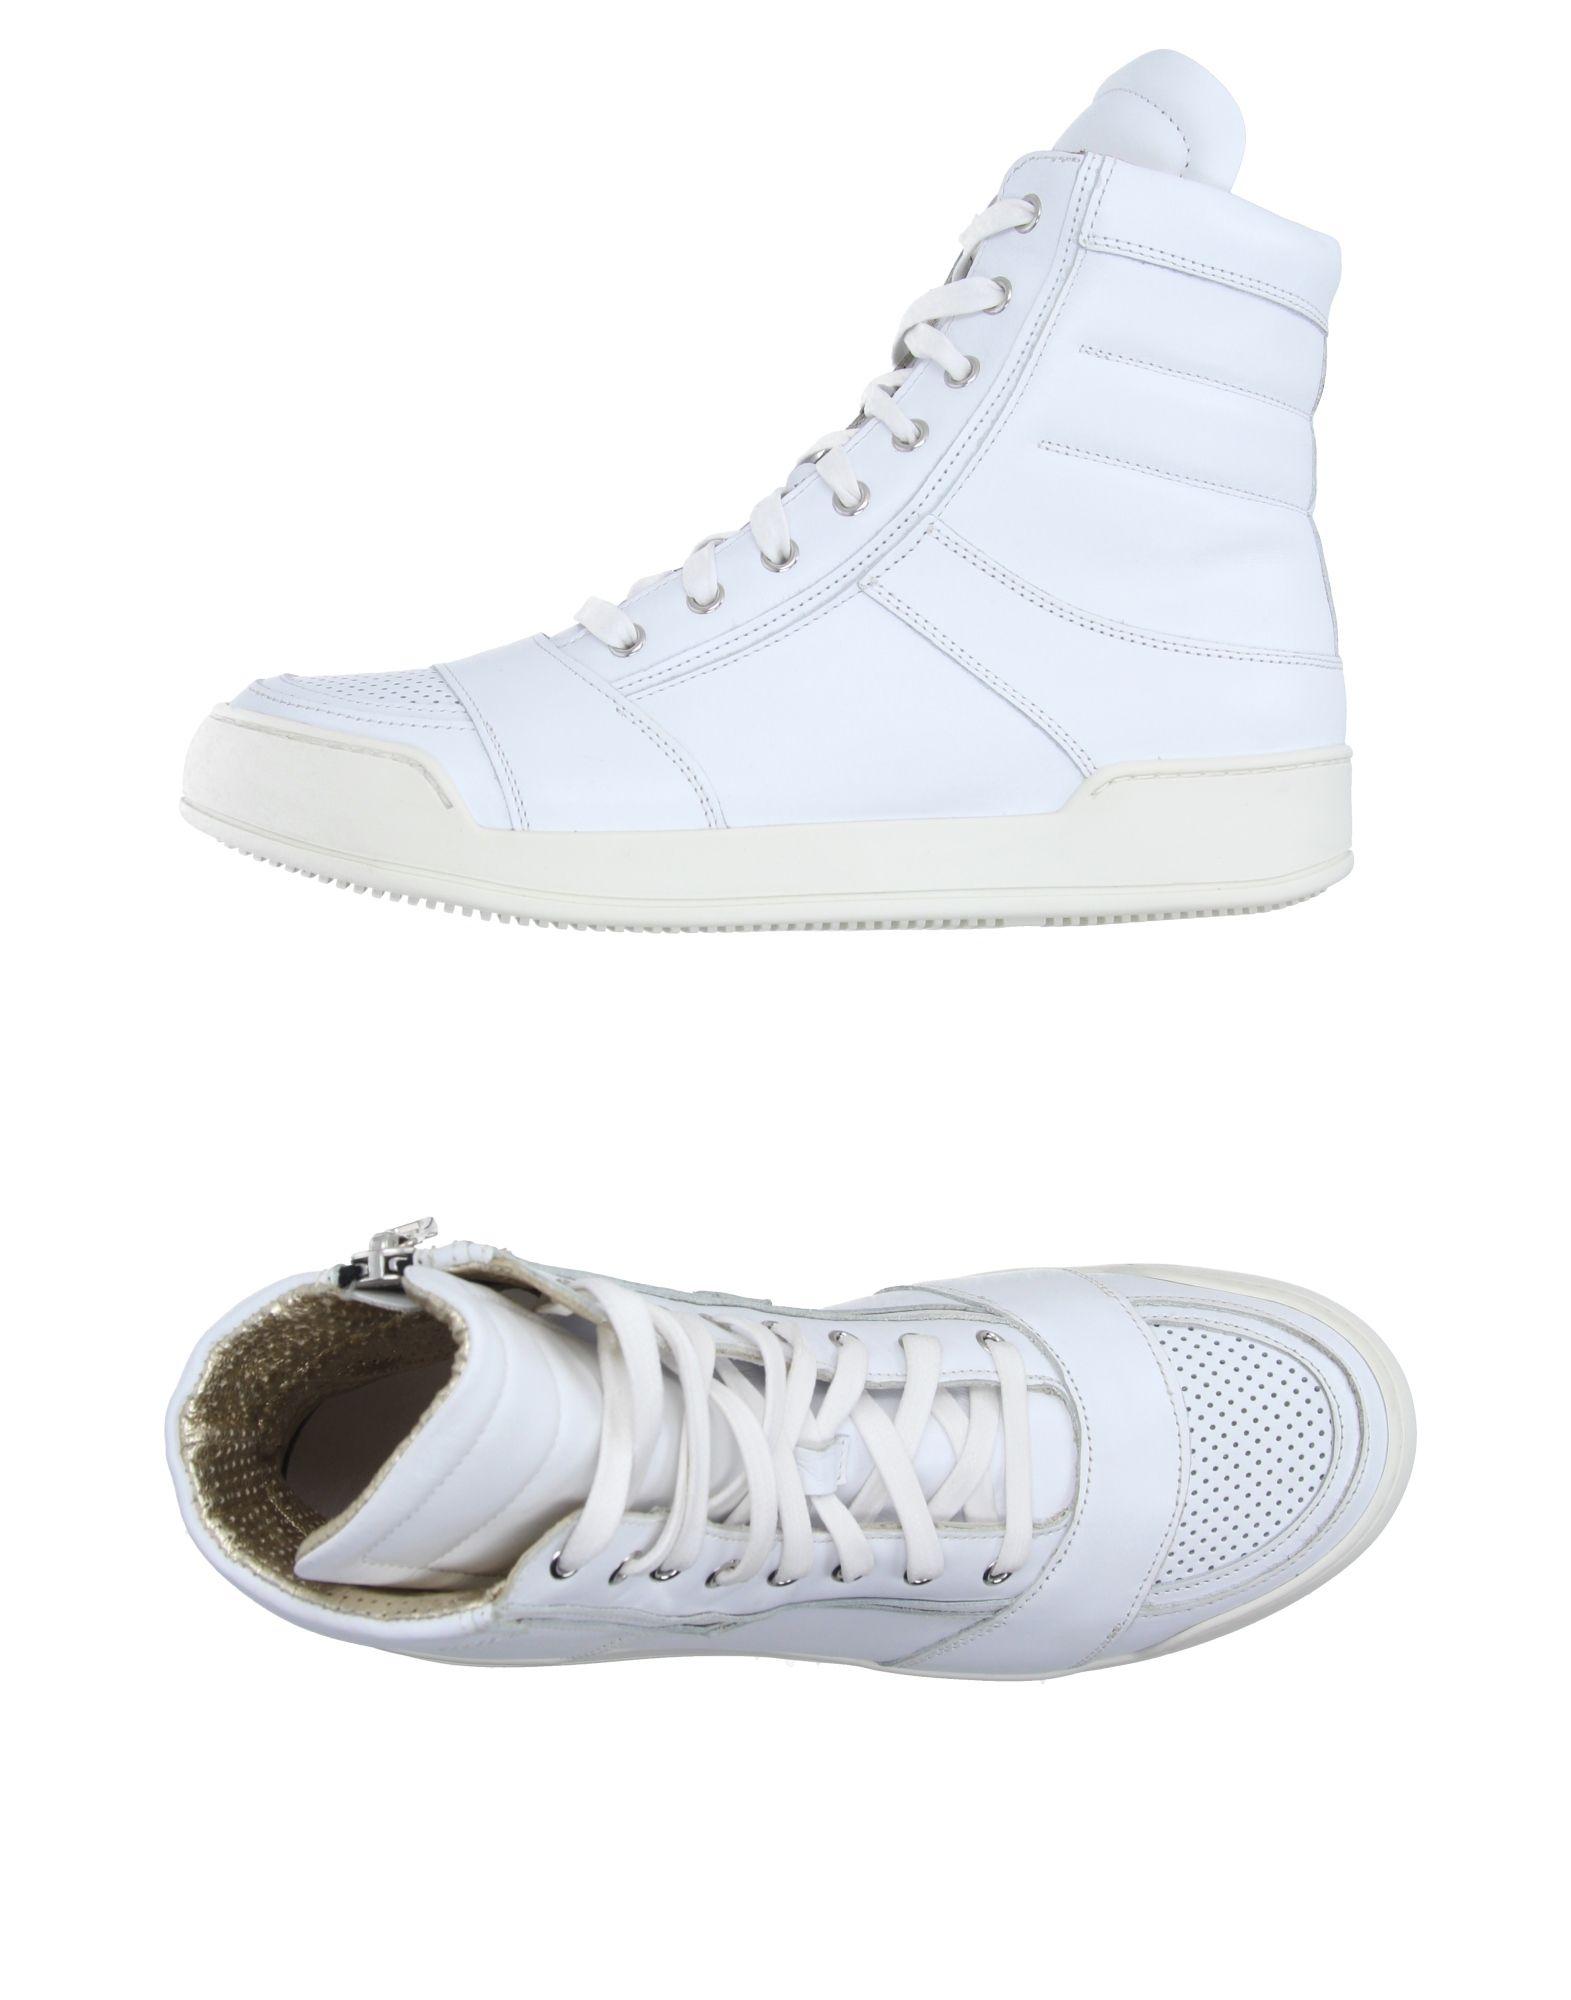 Sneakers Balmain Homme - Sneakers Balmain sur